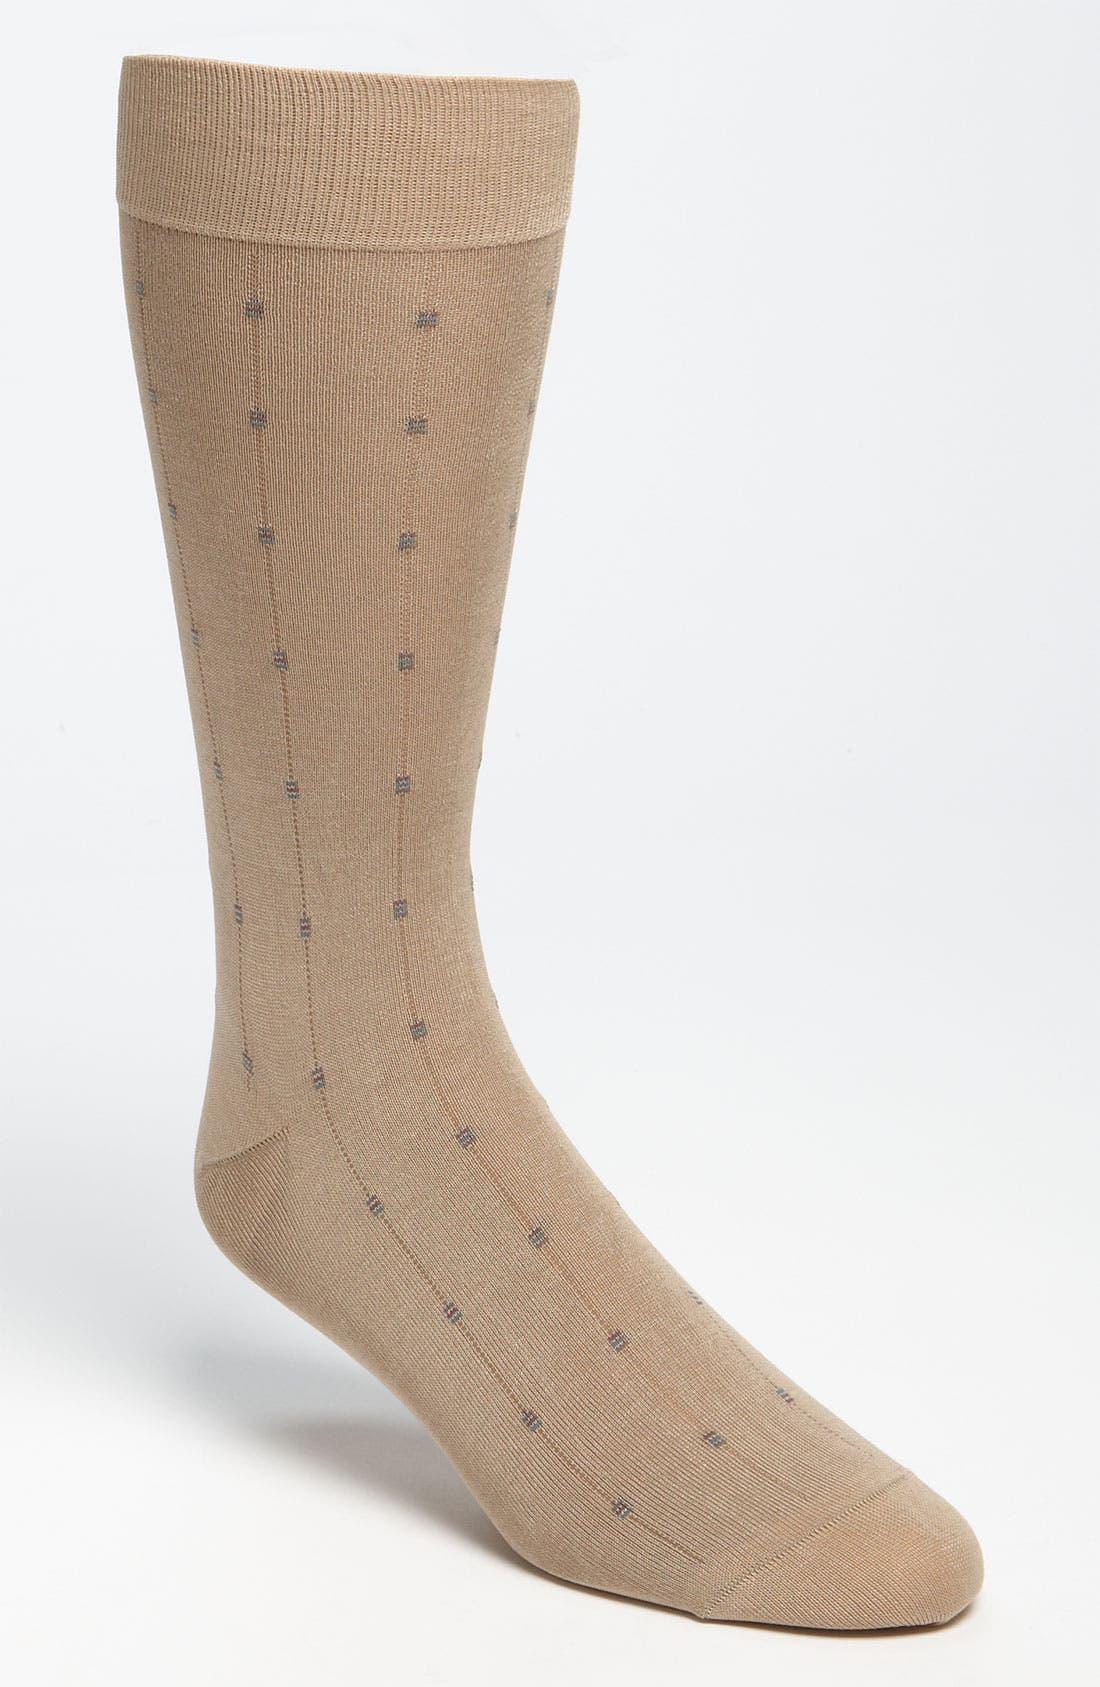 Main Image - Pantherella 'Bellringer' Socks